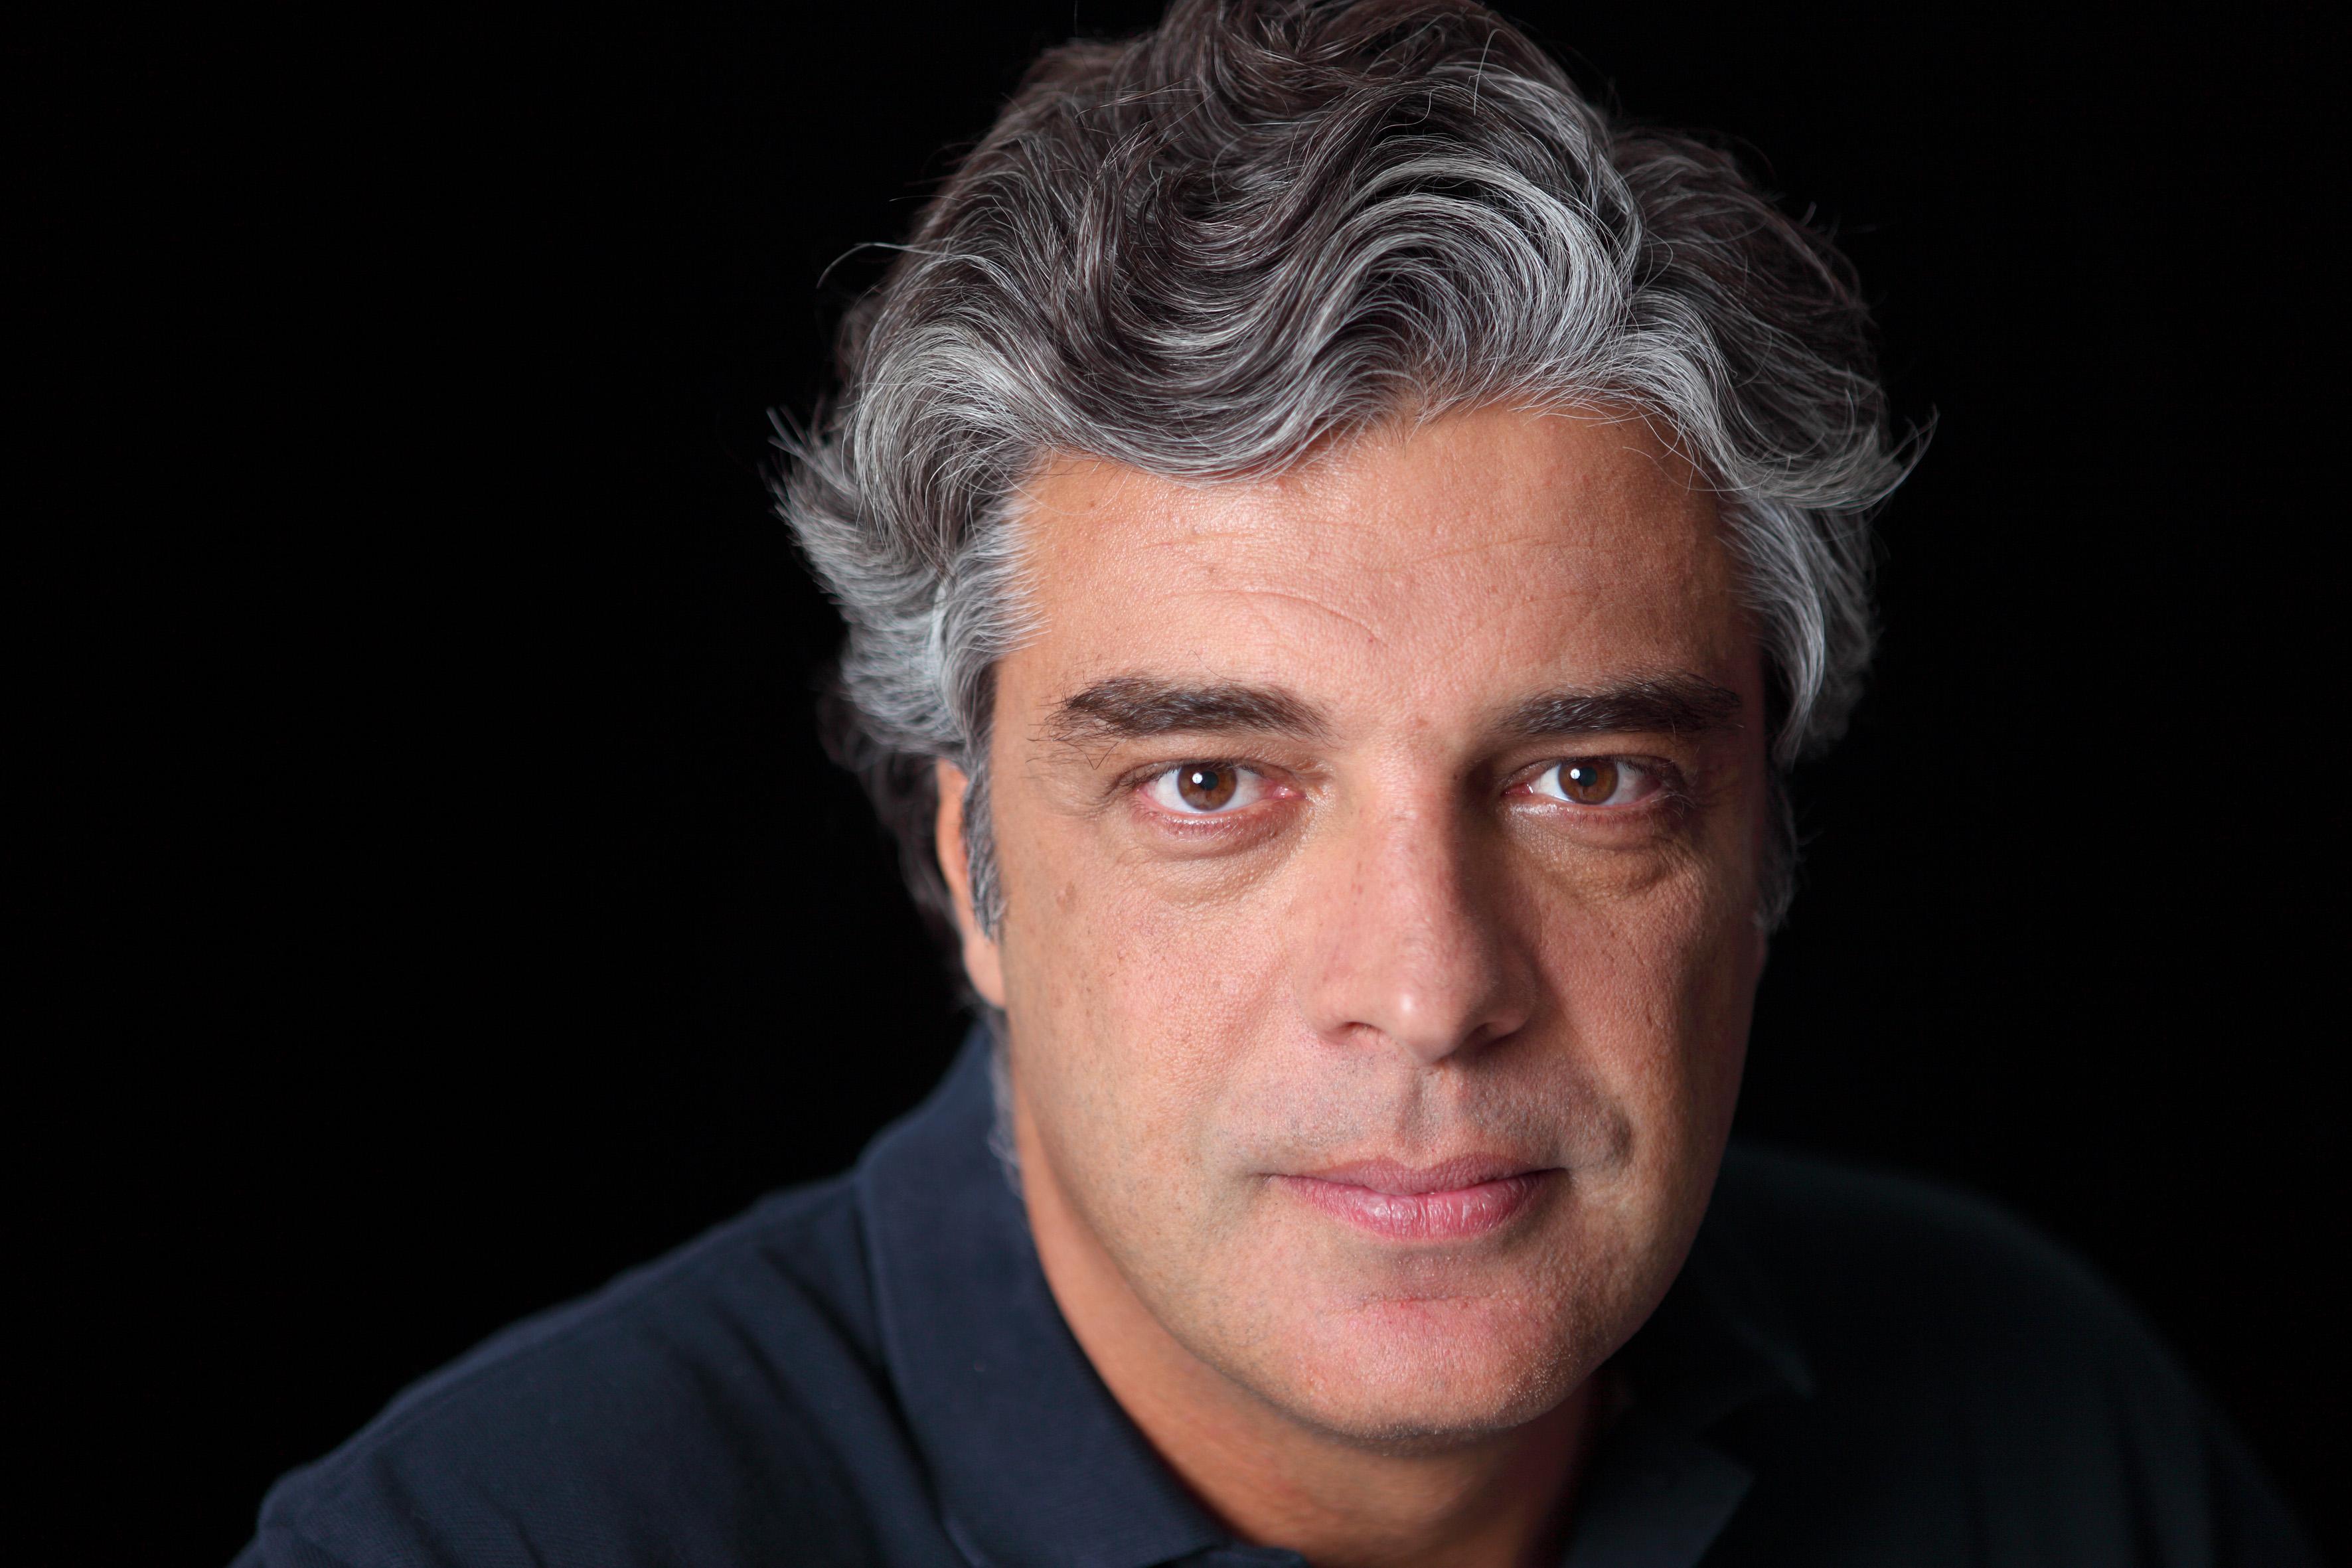 Entrevista com Marcello Serpa: Parte 1